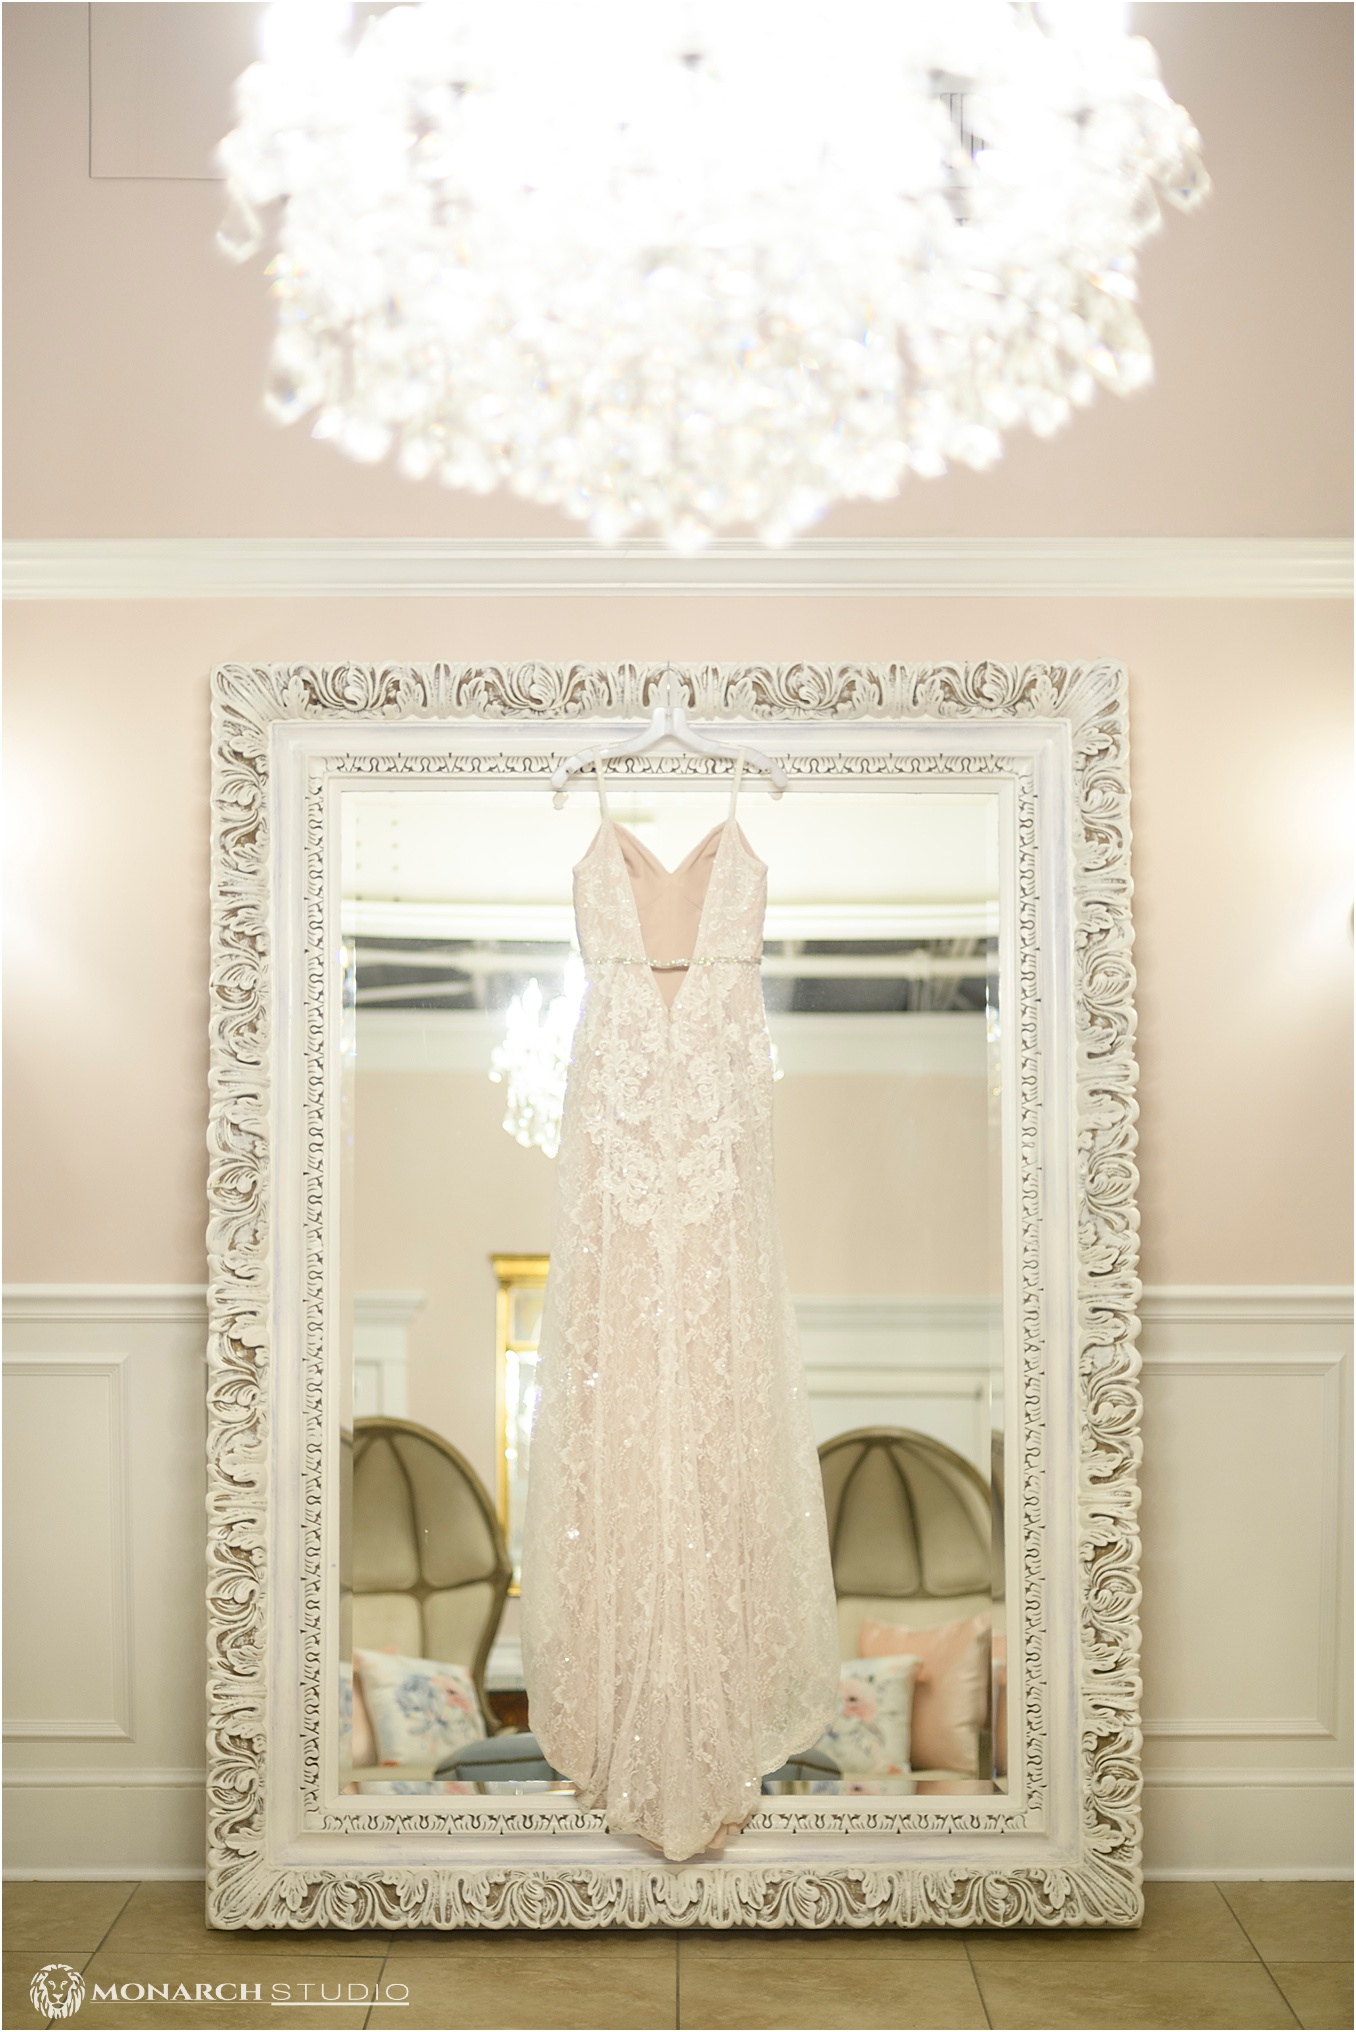 028-whiteroom-wedding-photographer-2019-05-22_0010.jpg